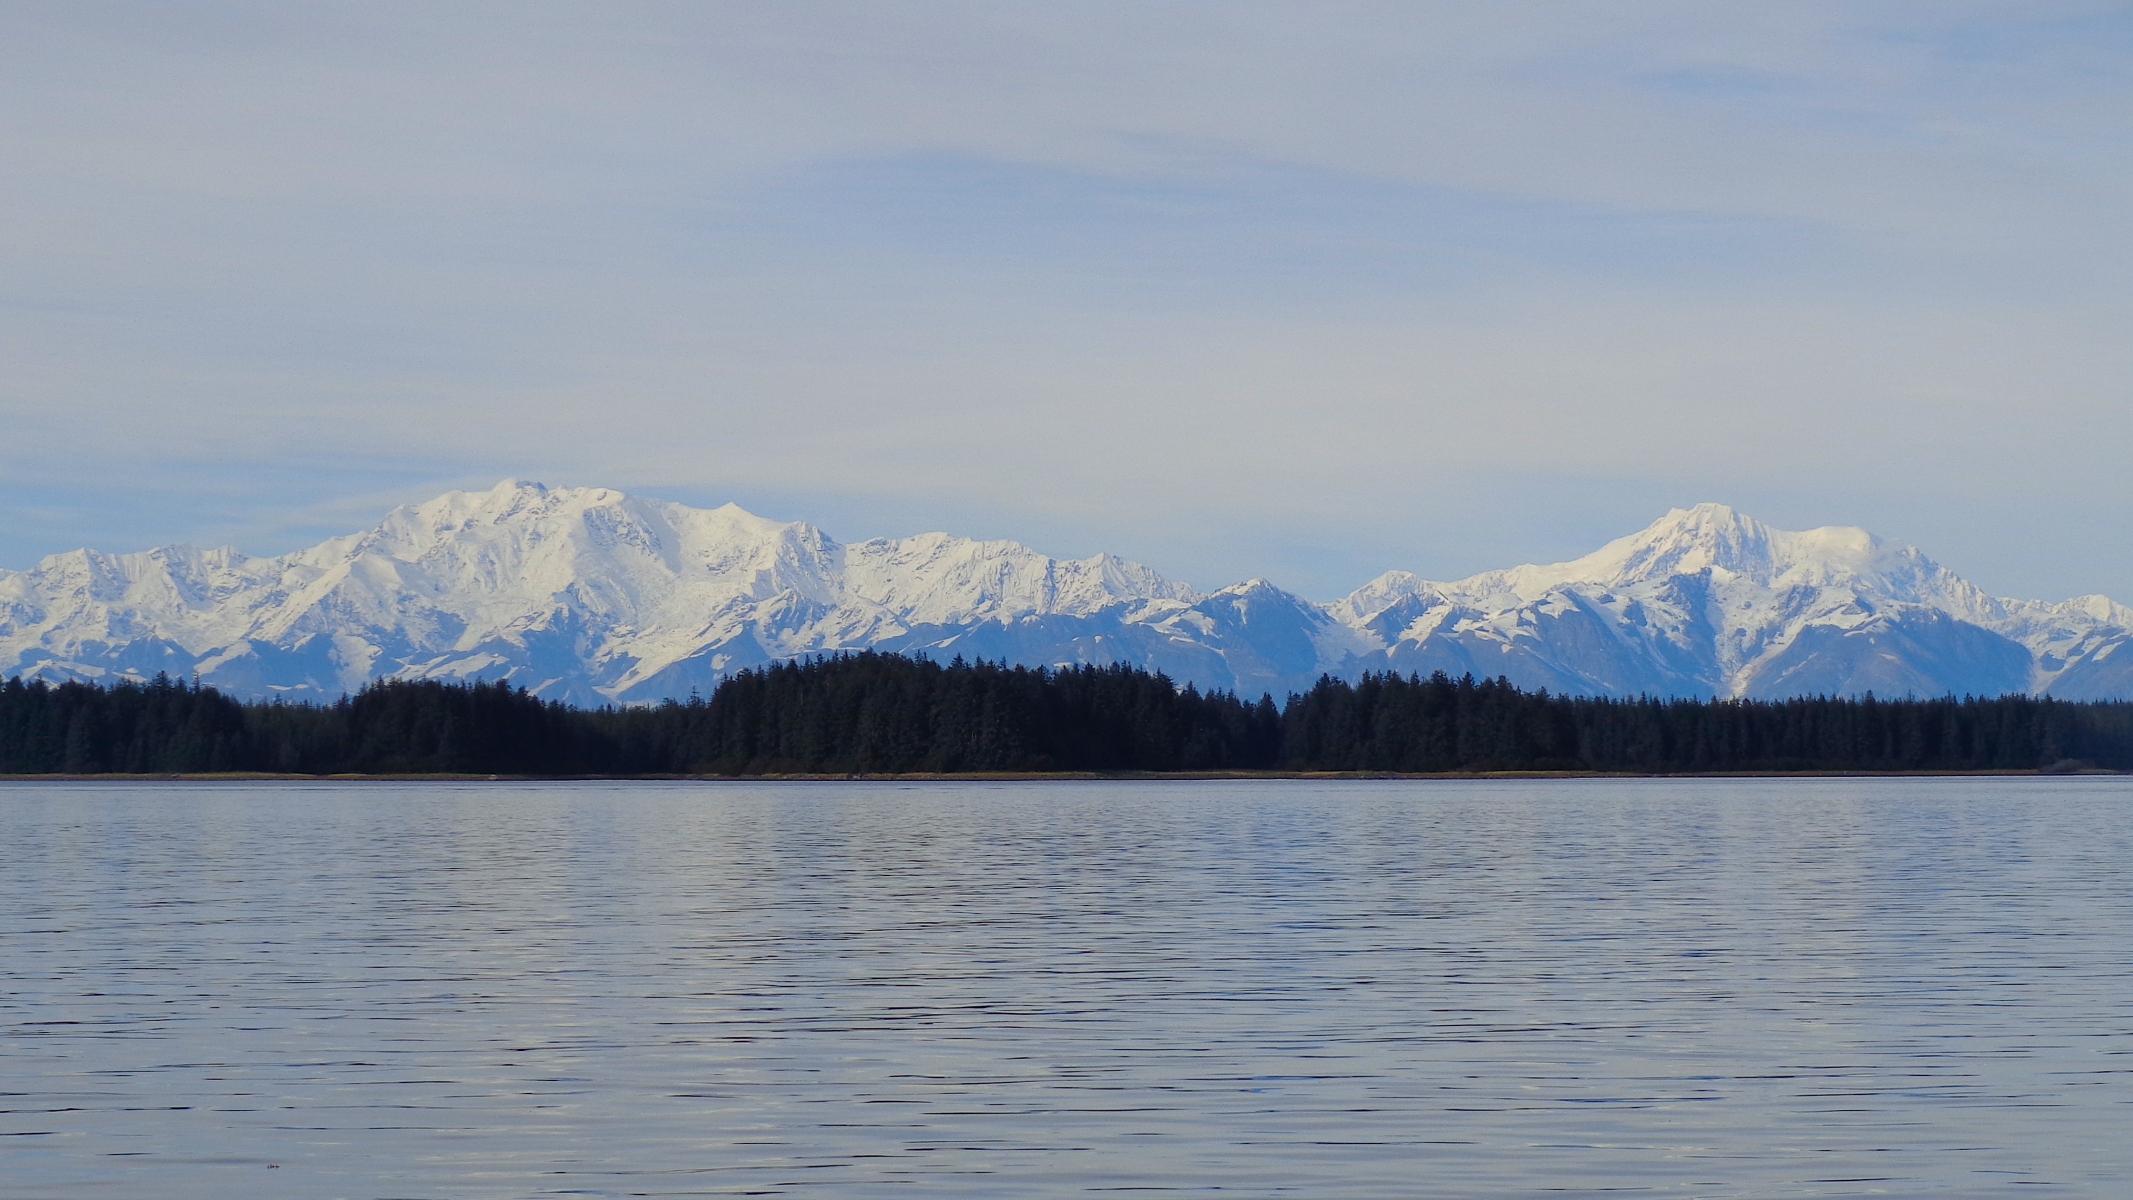 Malaspina Glacier, AK